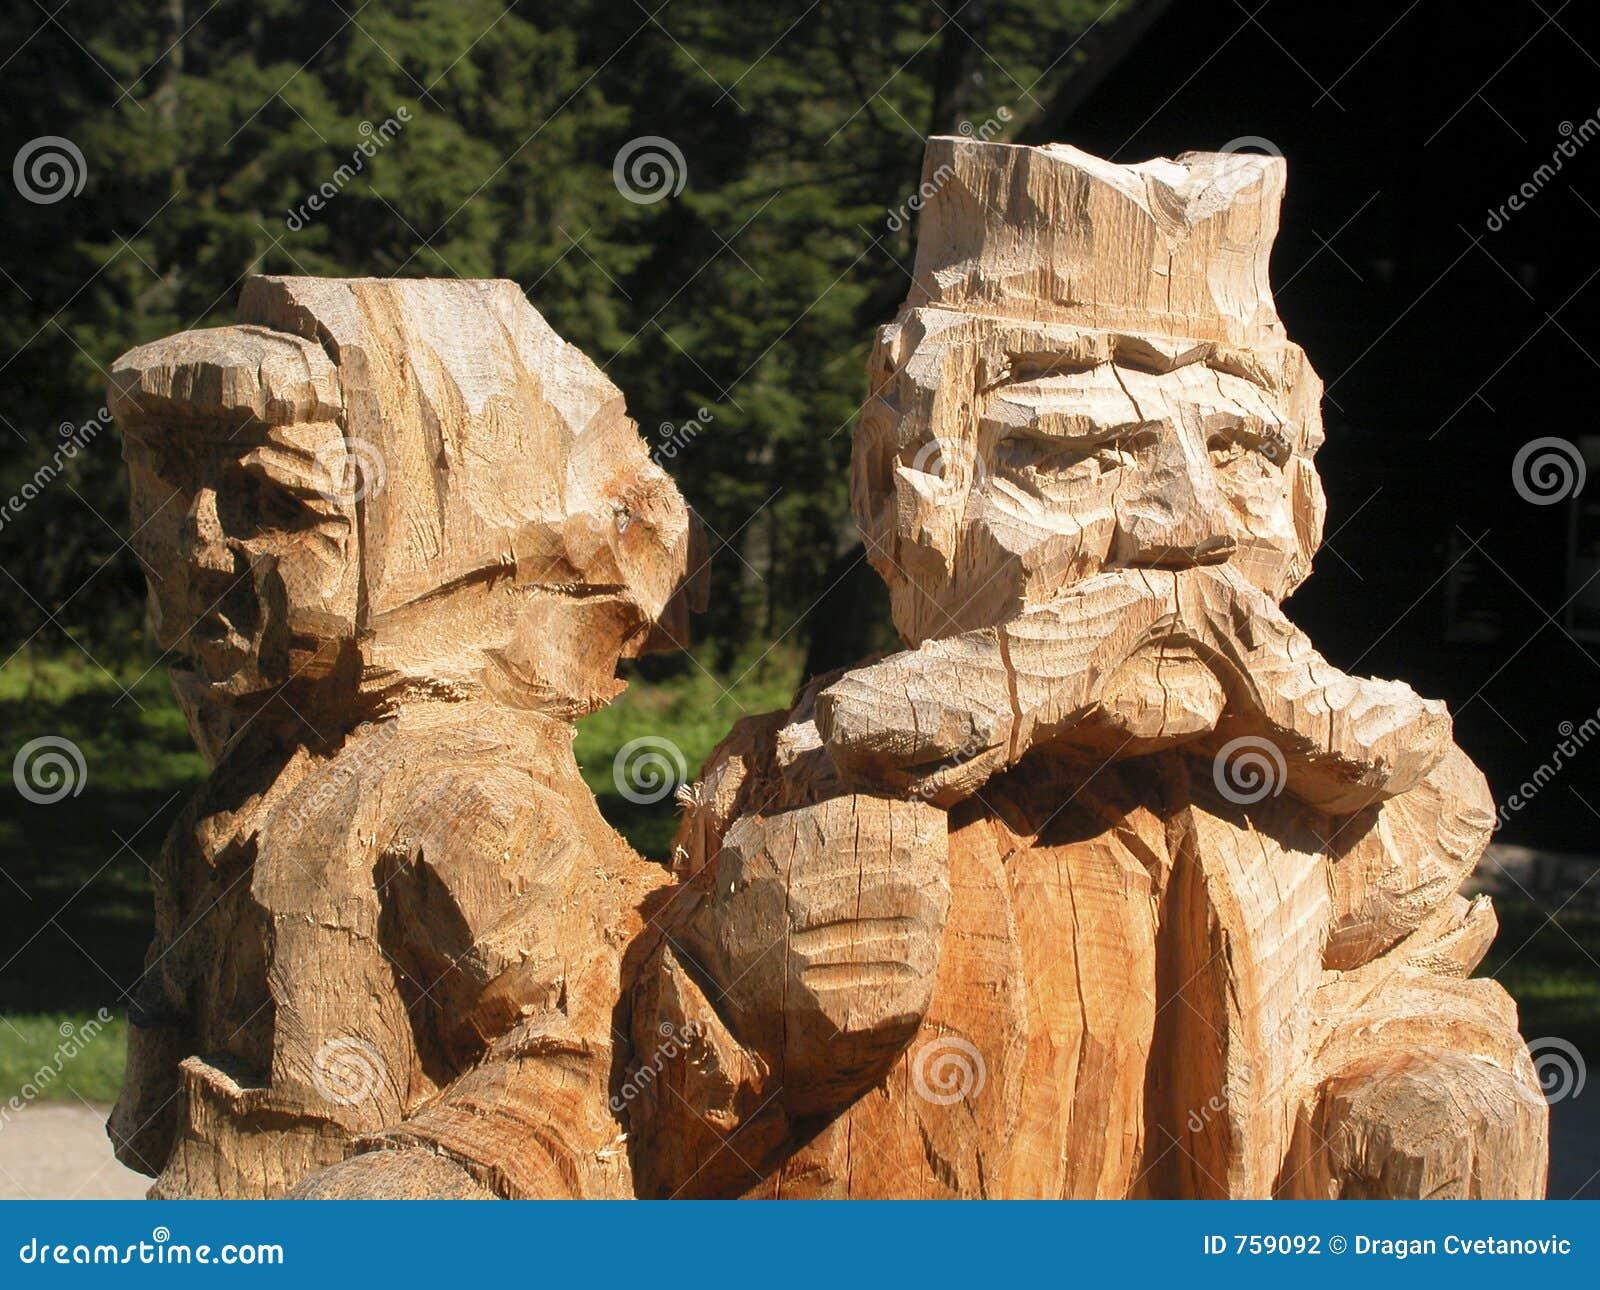 Ethno coarse woodwoork Gandmother and grandfather